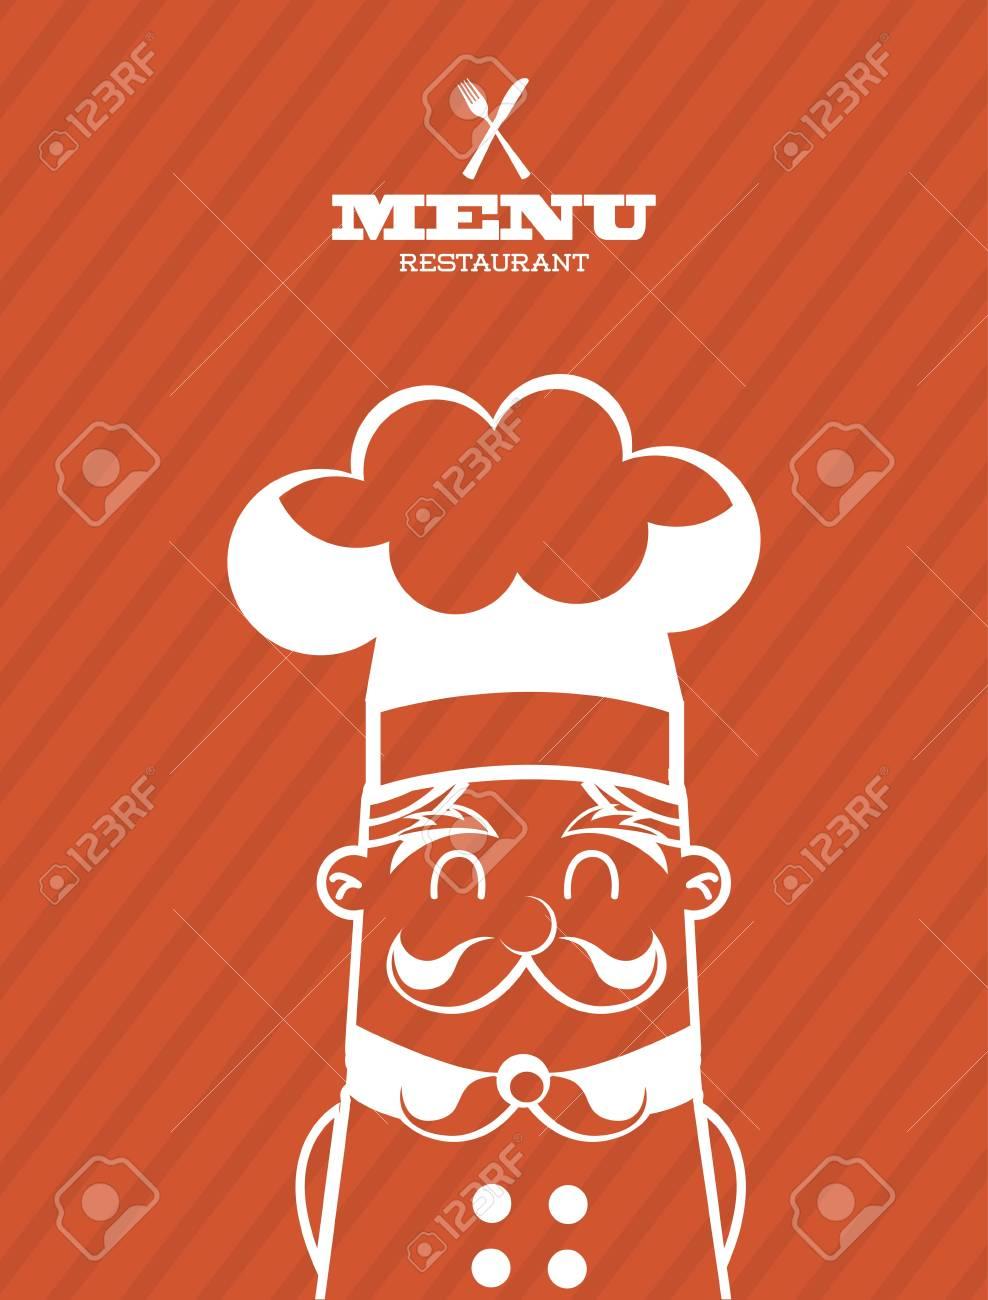 chef icon over orange background  vector illustration Stock Vector - 23234828